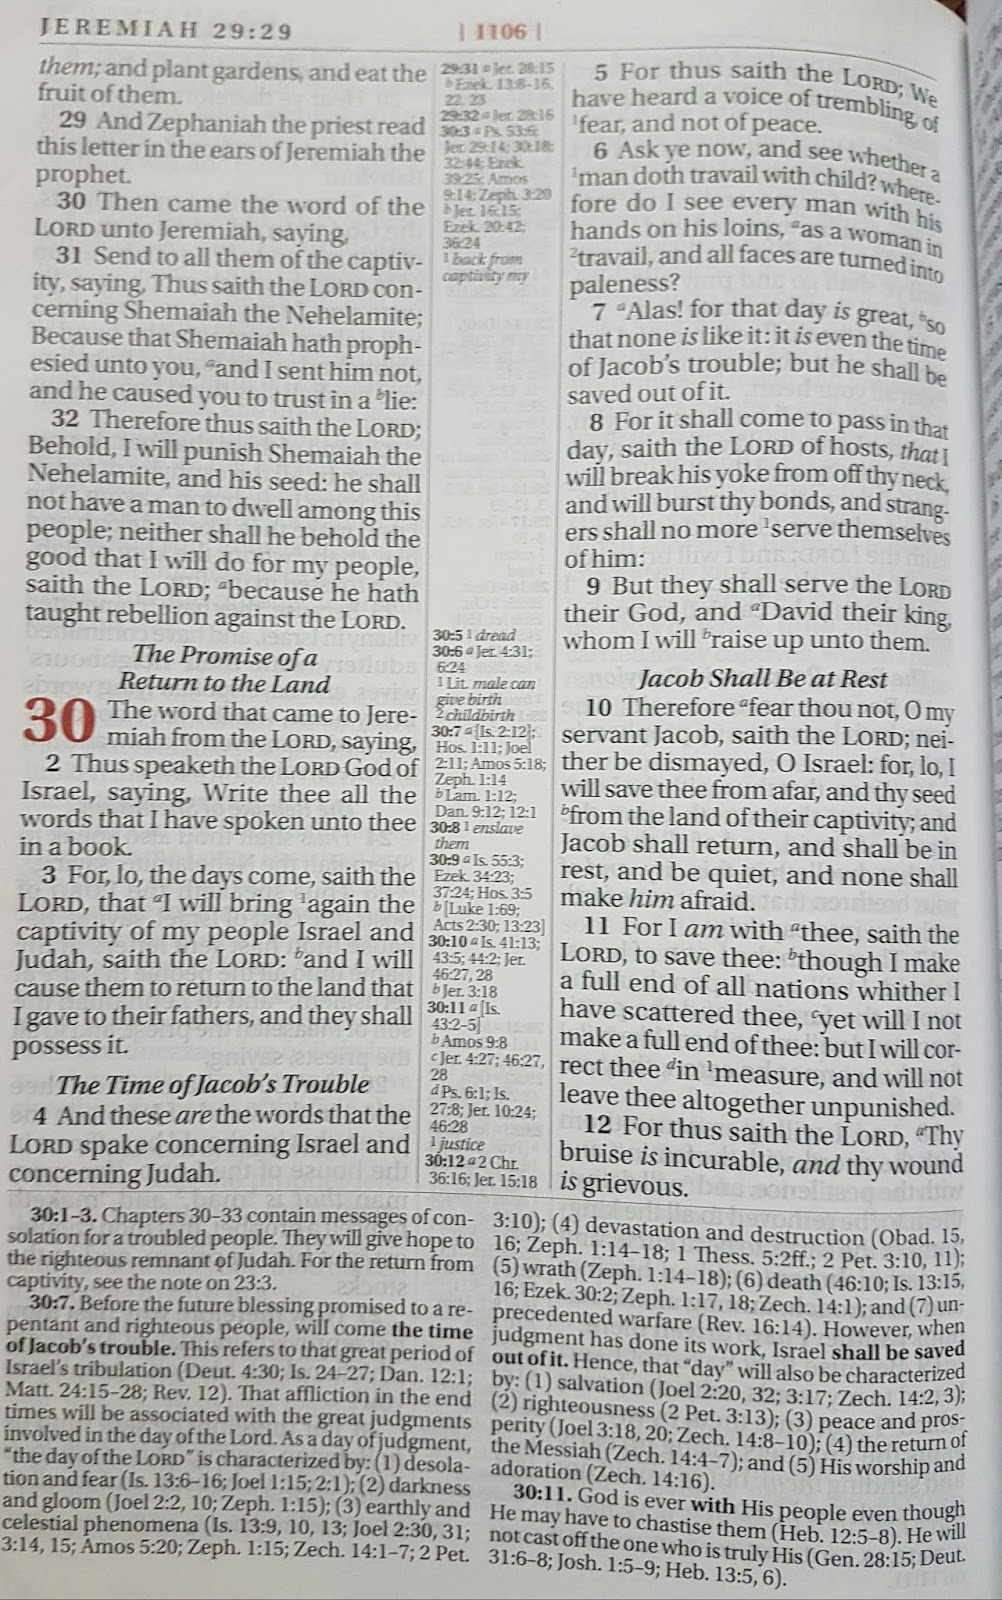 Christians Should Not Hold Grudges...